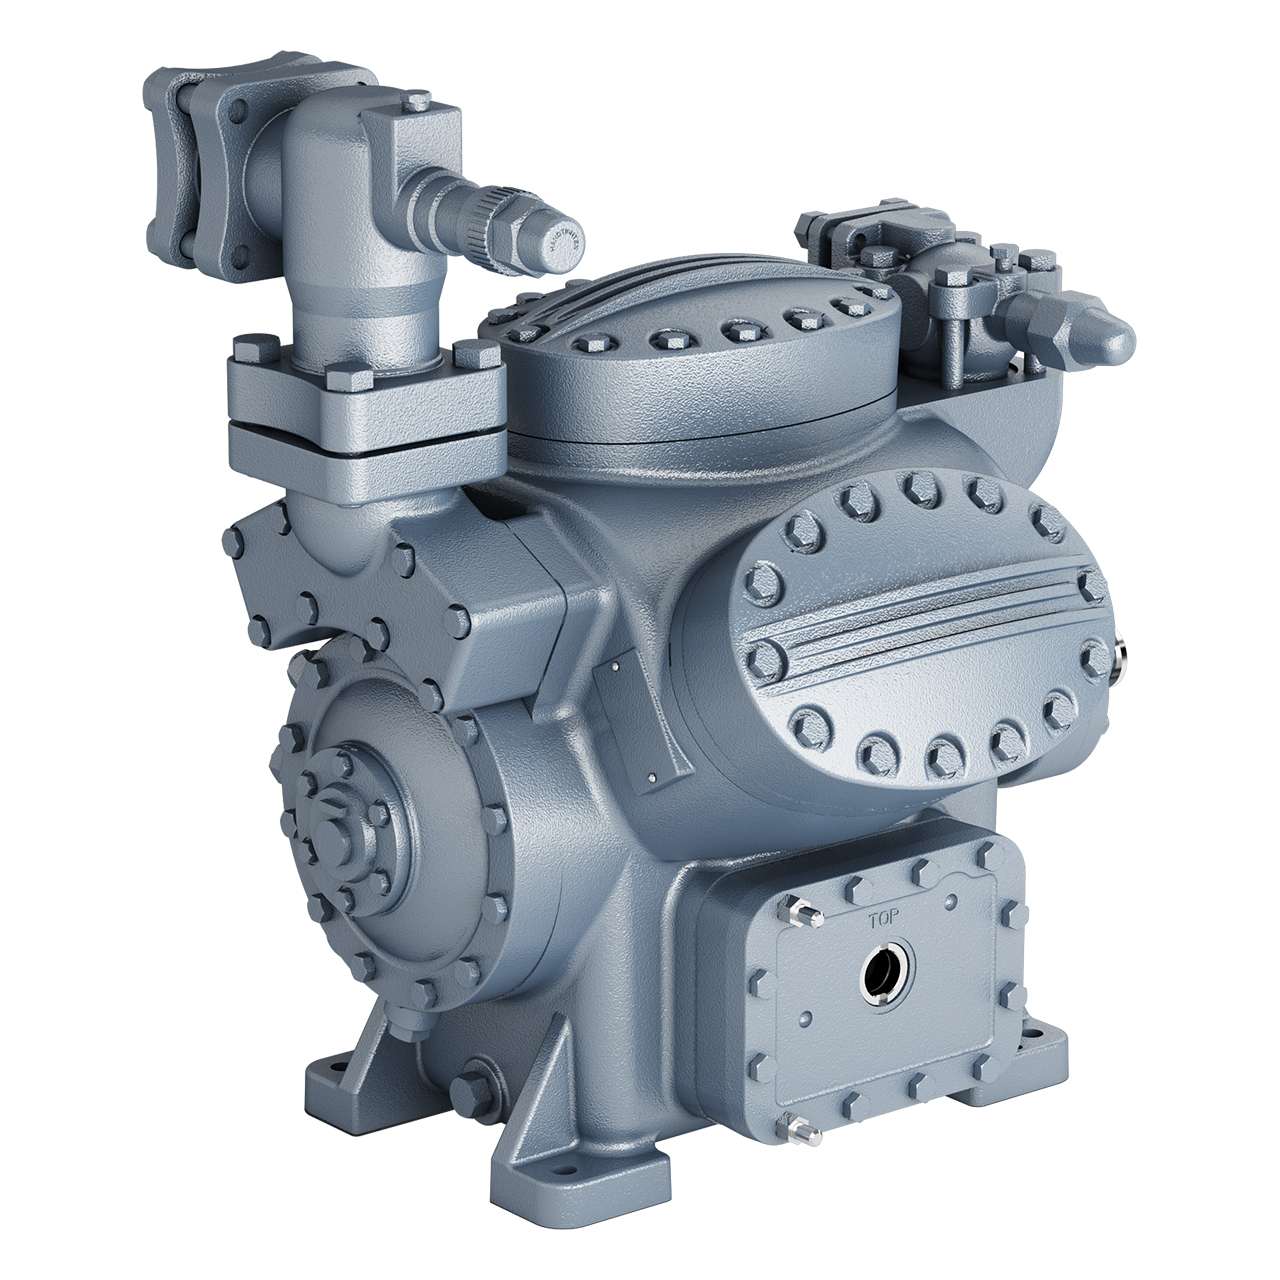 carlyle-compressor-5f